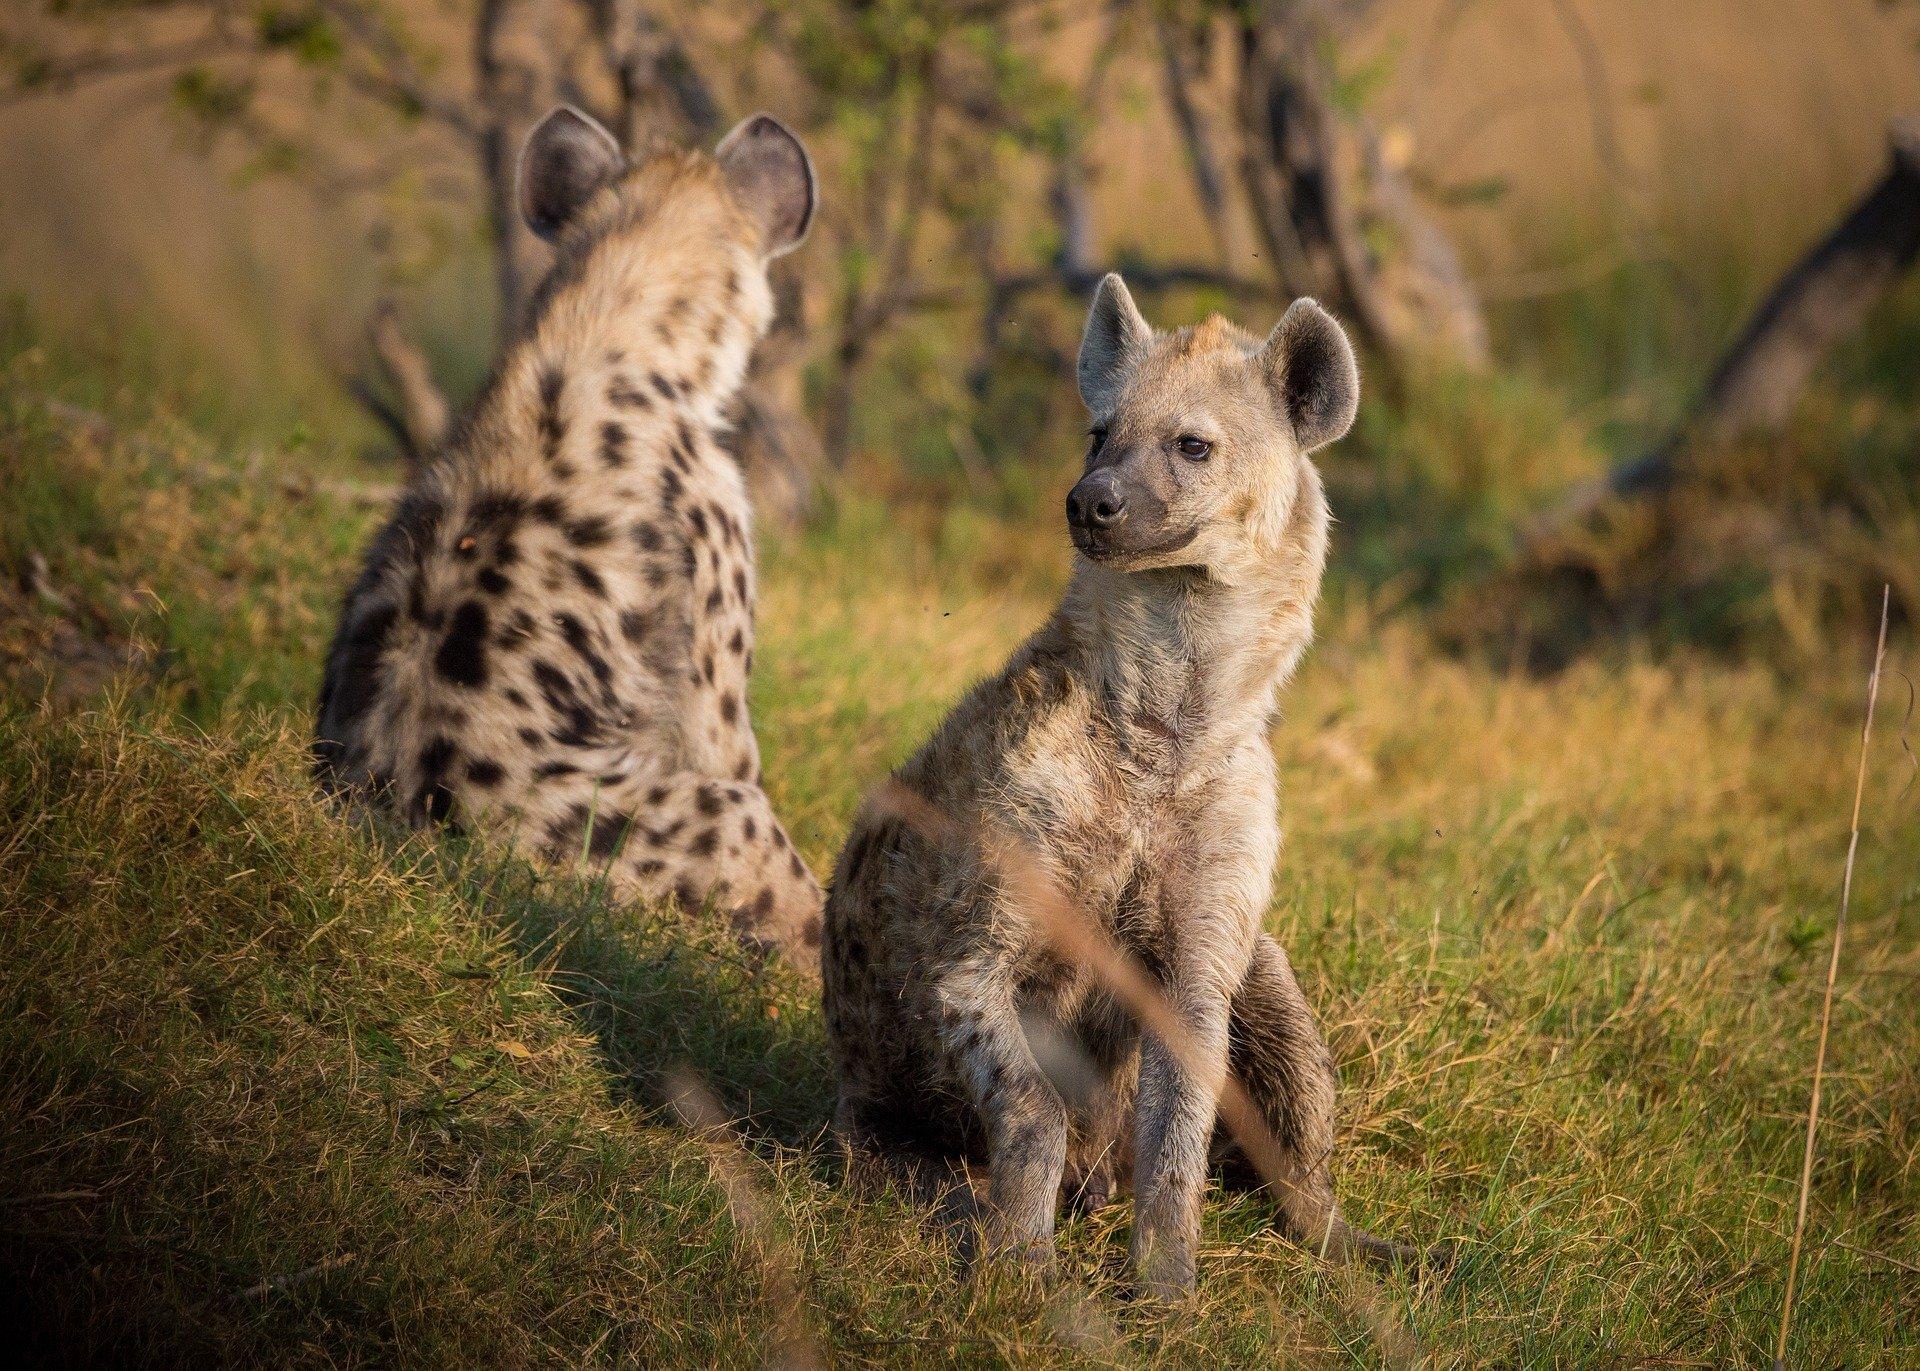 Hyena Pair, Hyena Clan, Hyena Social Group